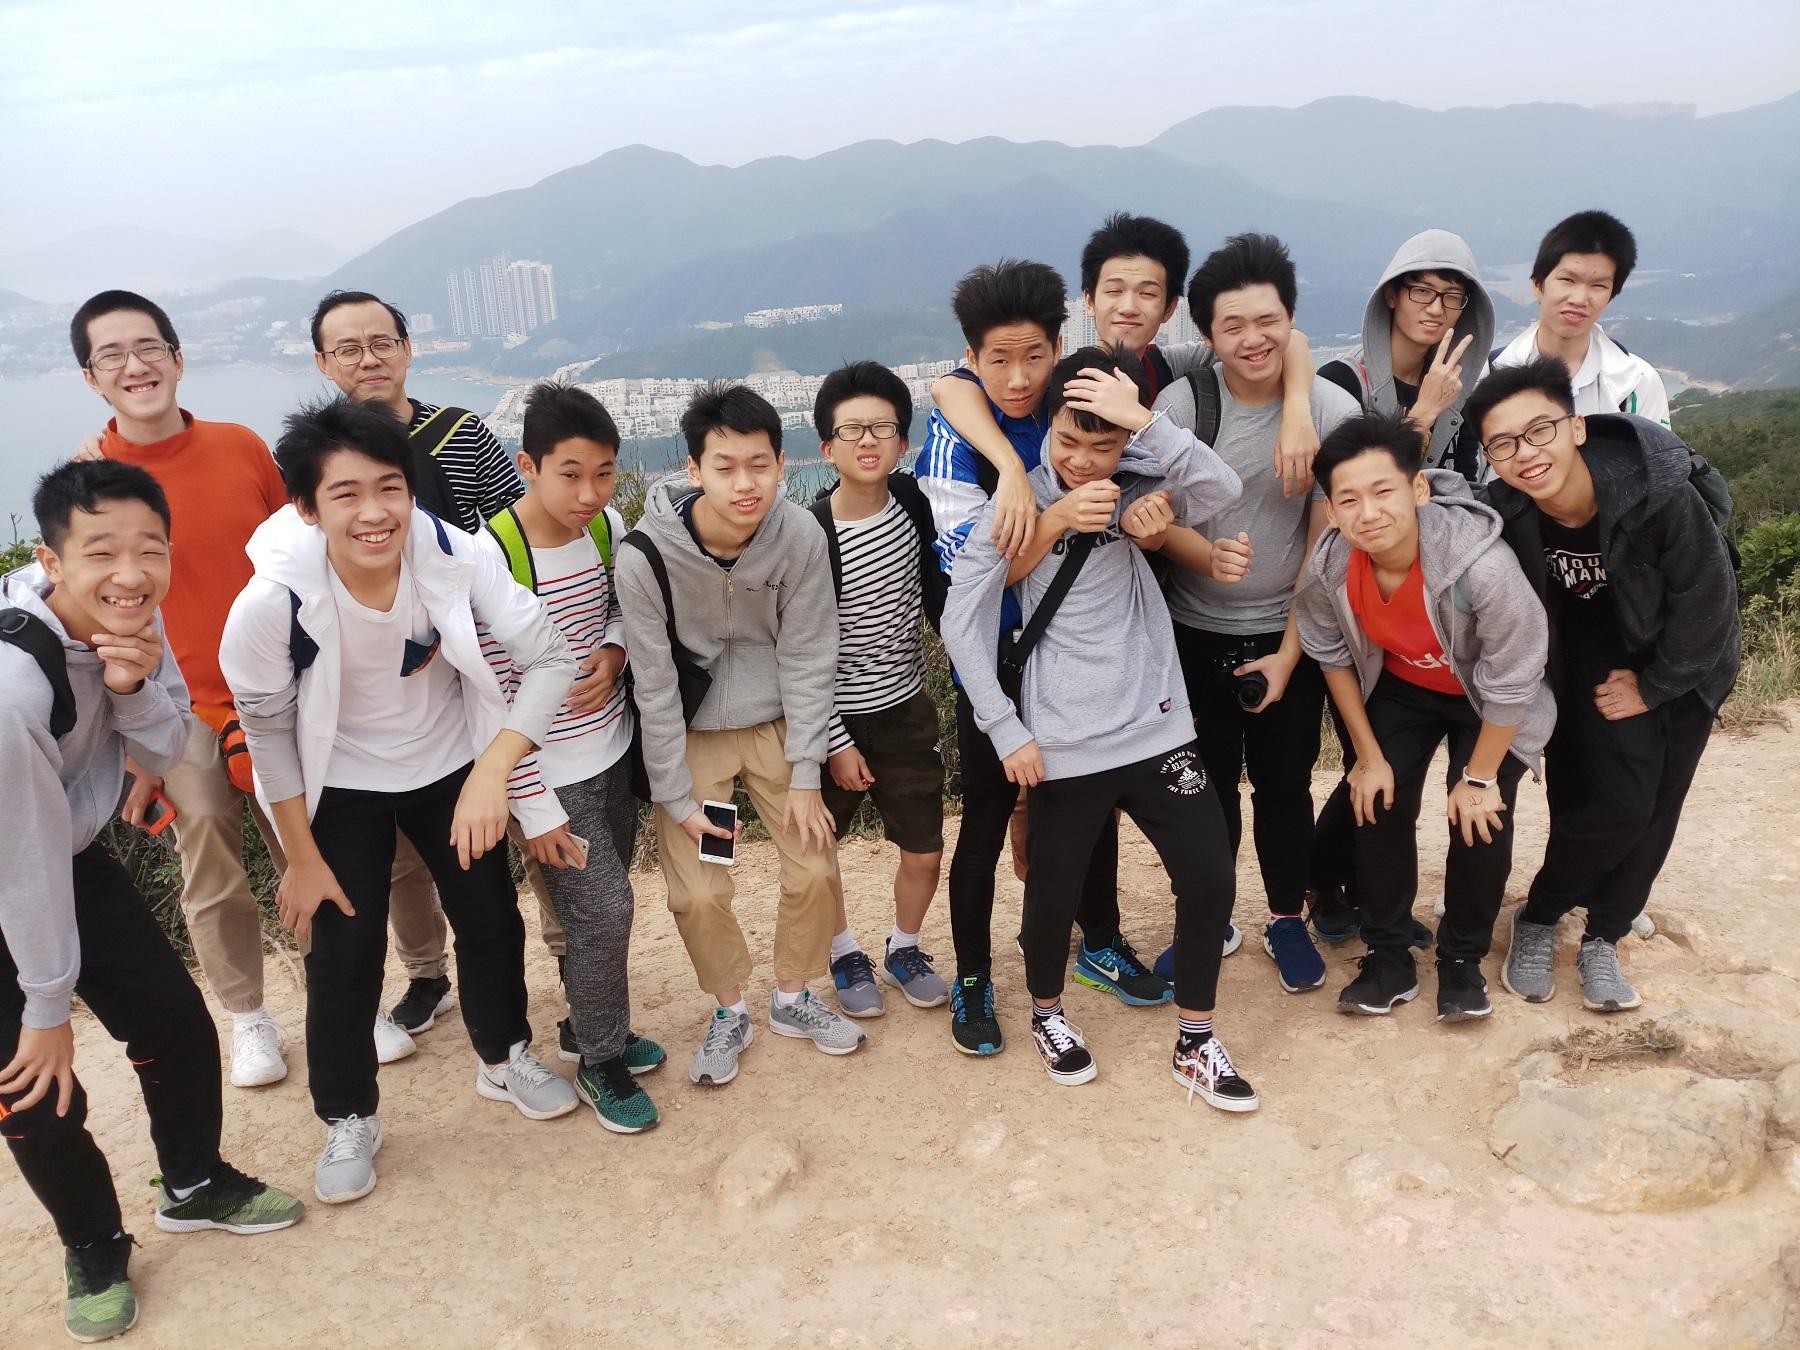 https://npc.edu.hk/sites/default/files/20181222_105006.jpg